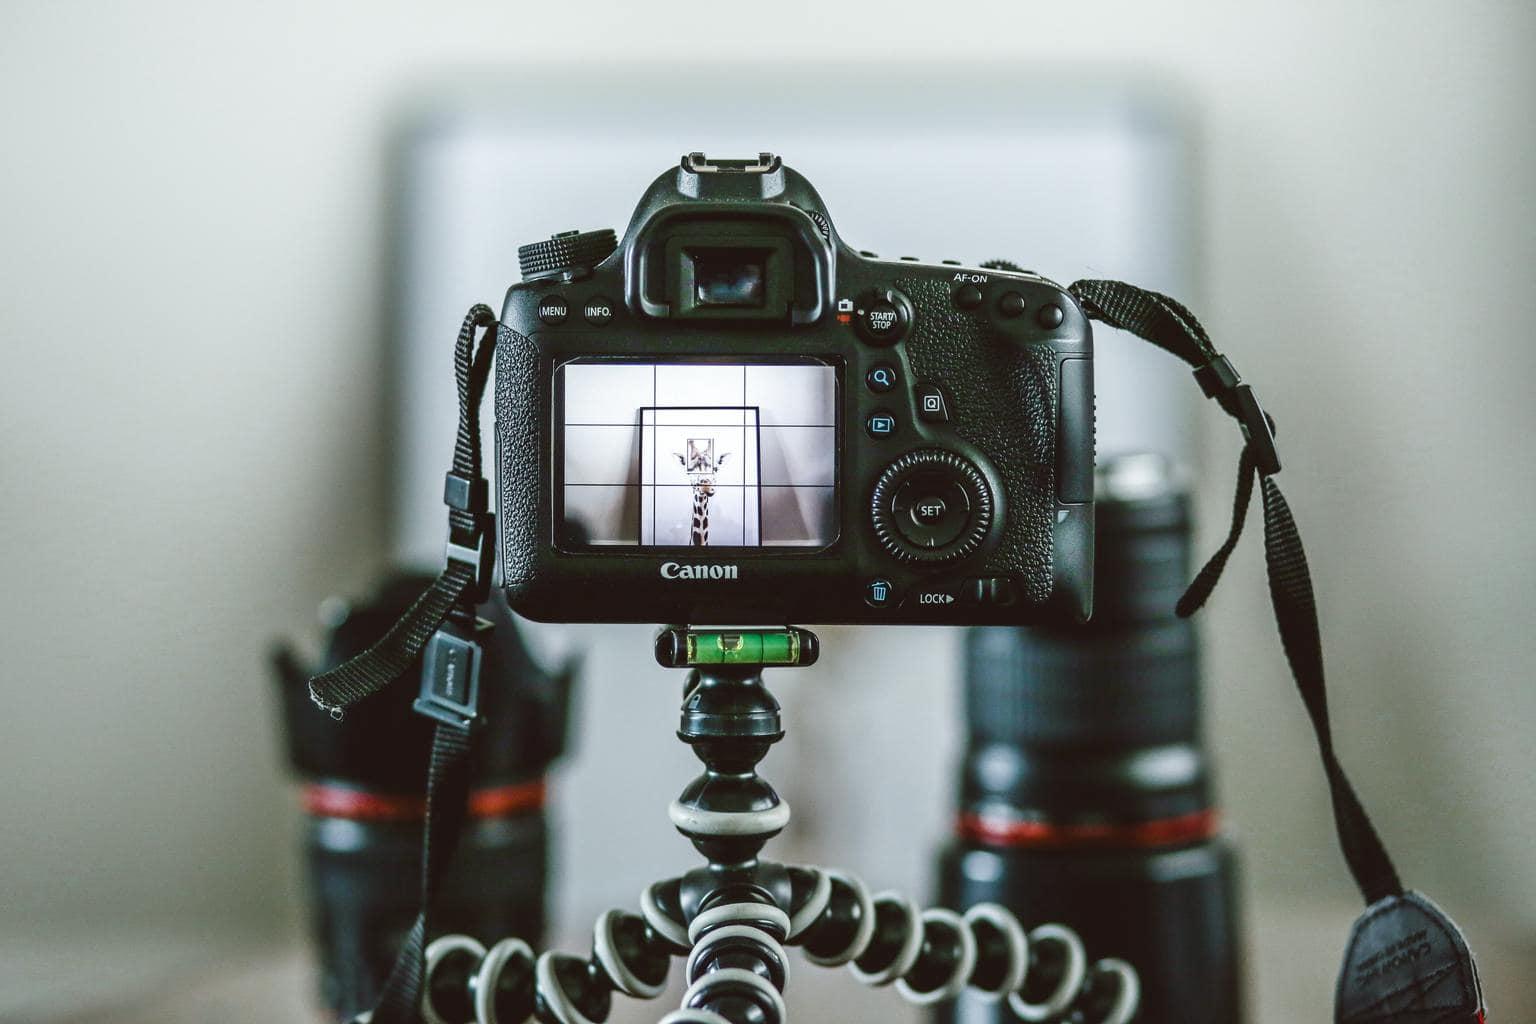 pantalla cámara enfocando un objeto